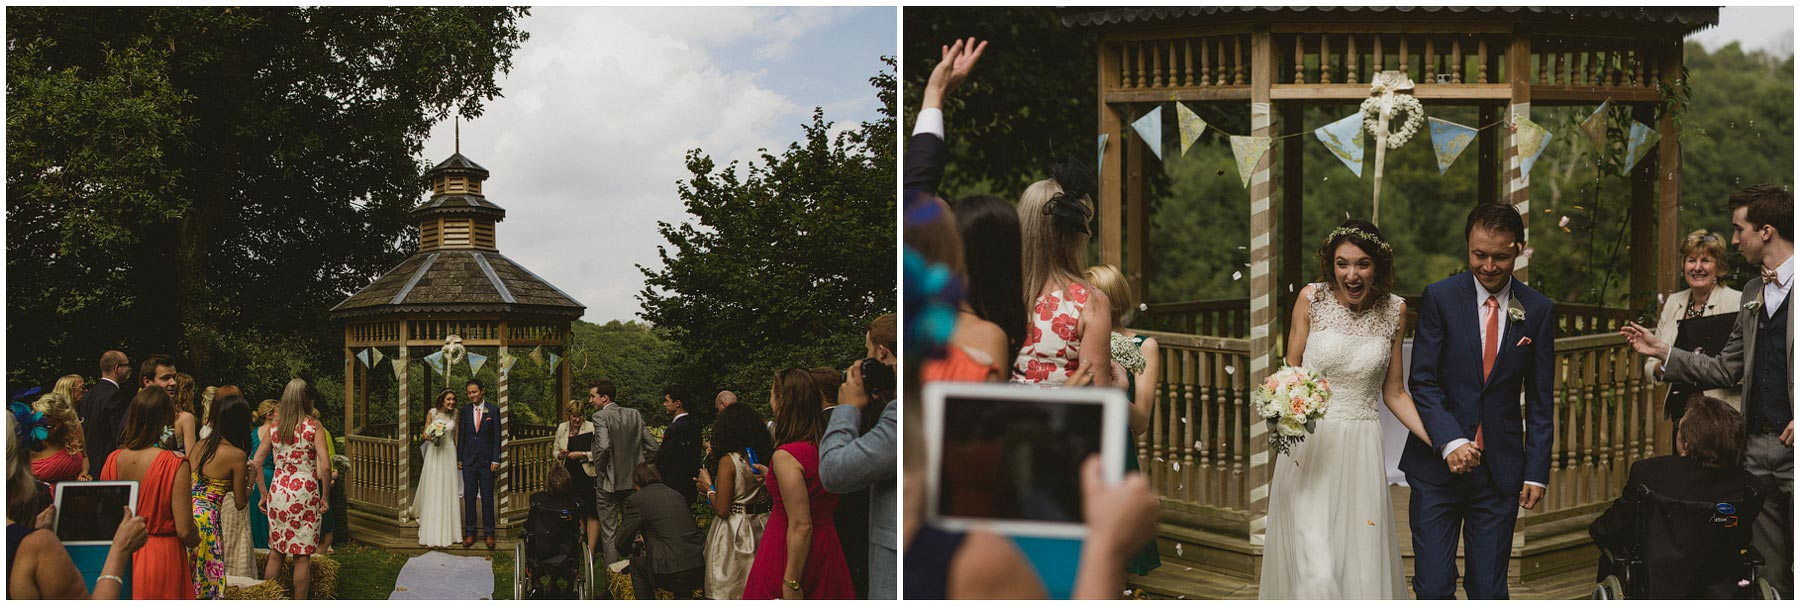 Colehayes-Park-Wedding-Photography_0093